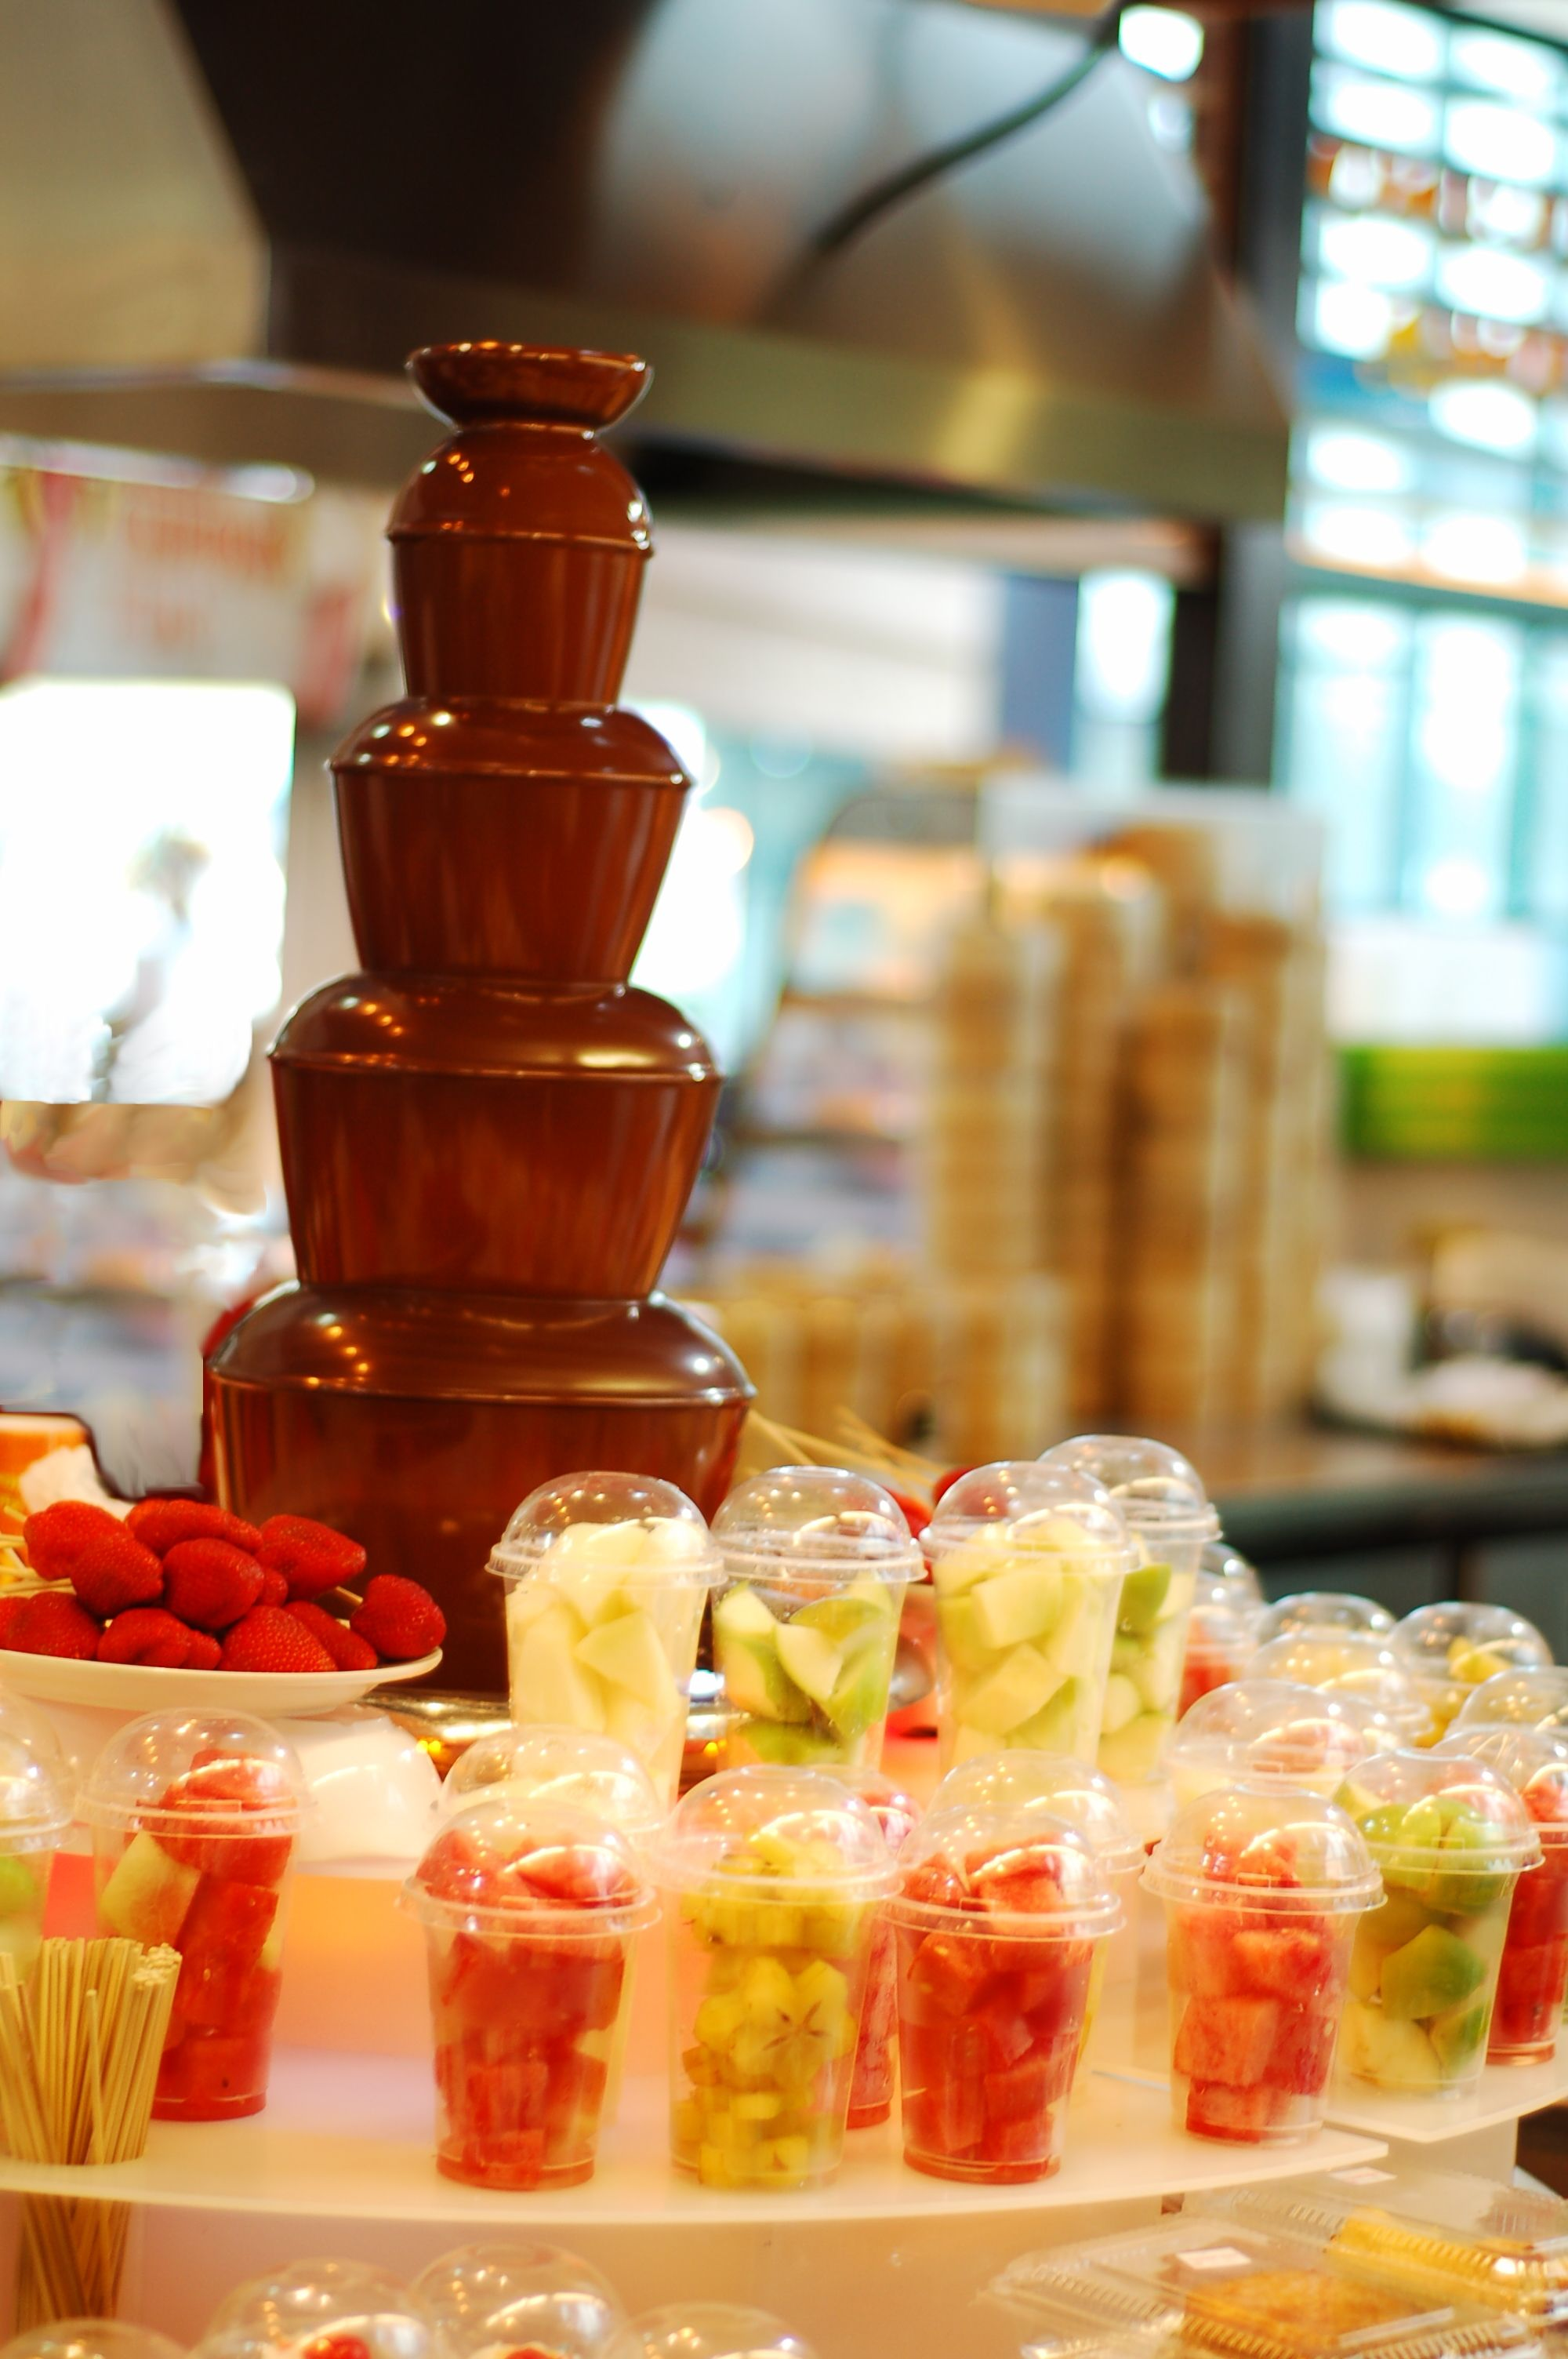 Fuente de Chocolate | Guasacaca Dulce | Pinterest | Chocolate